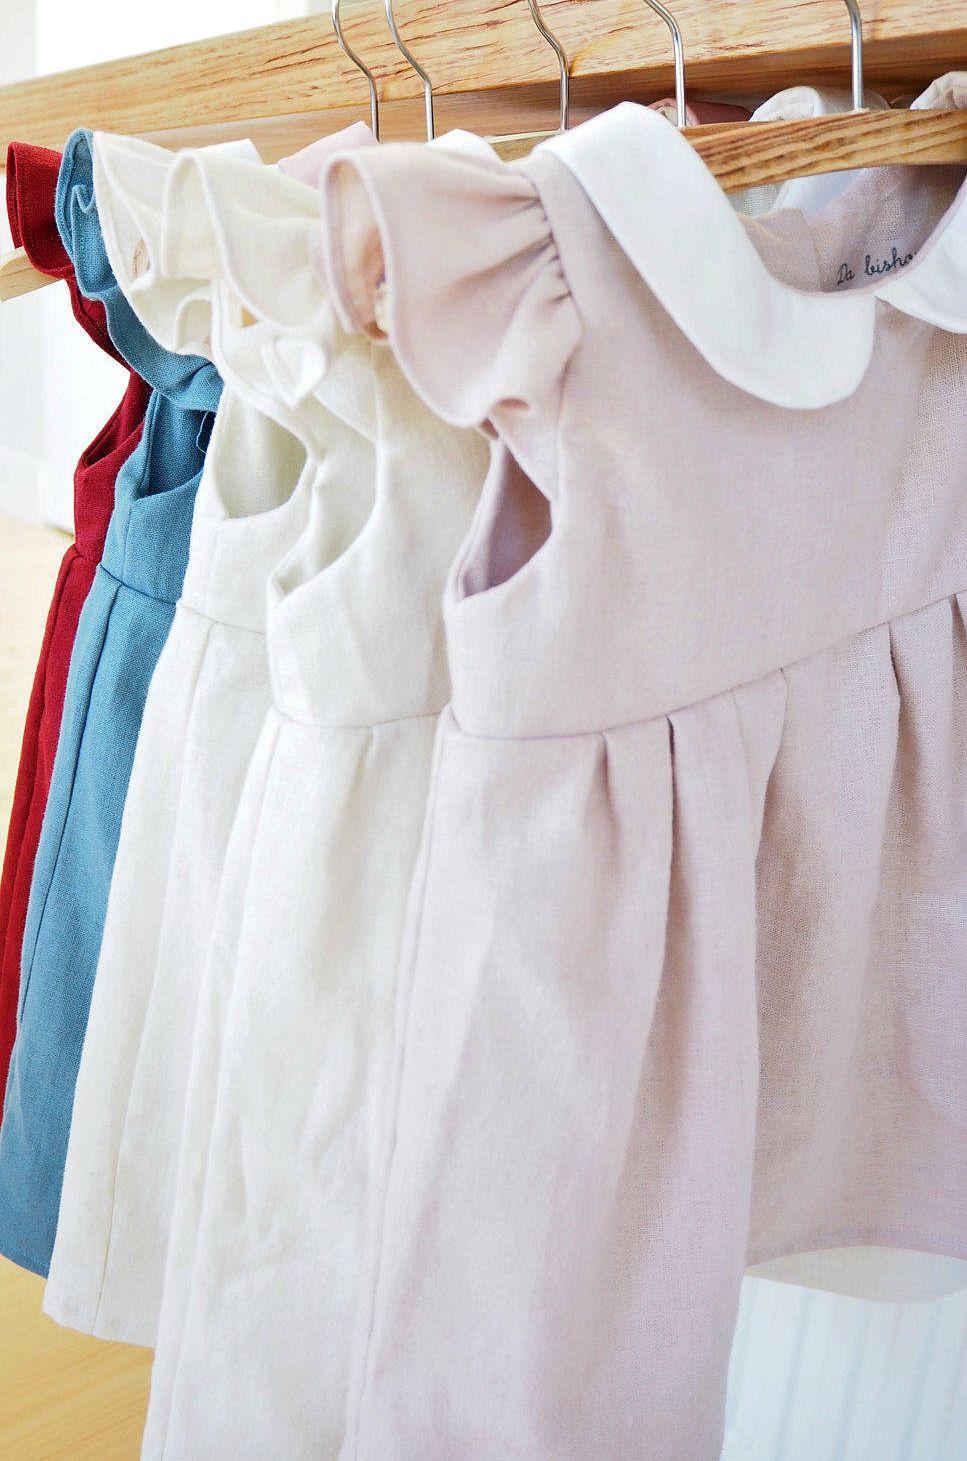 b4bfdf0f9 Vintage Style Handmade Linen Dresses